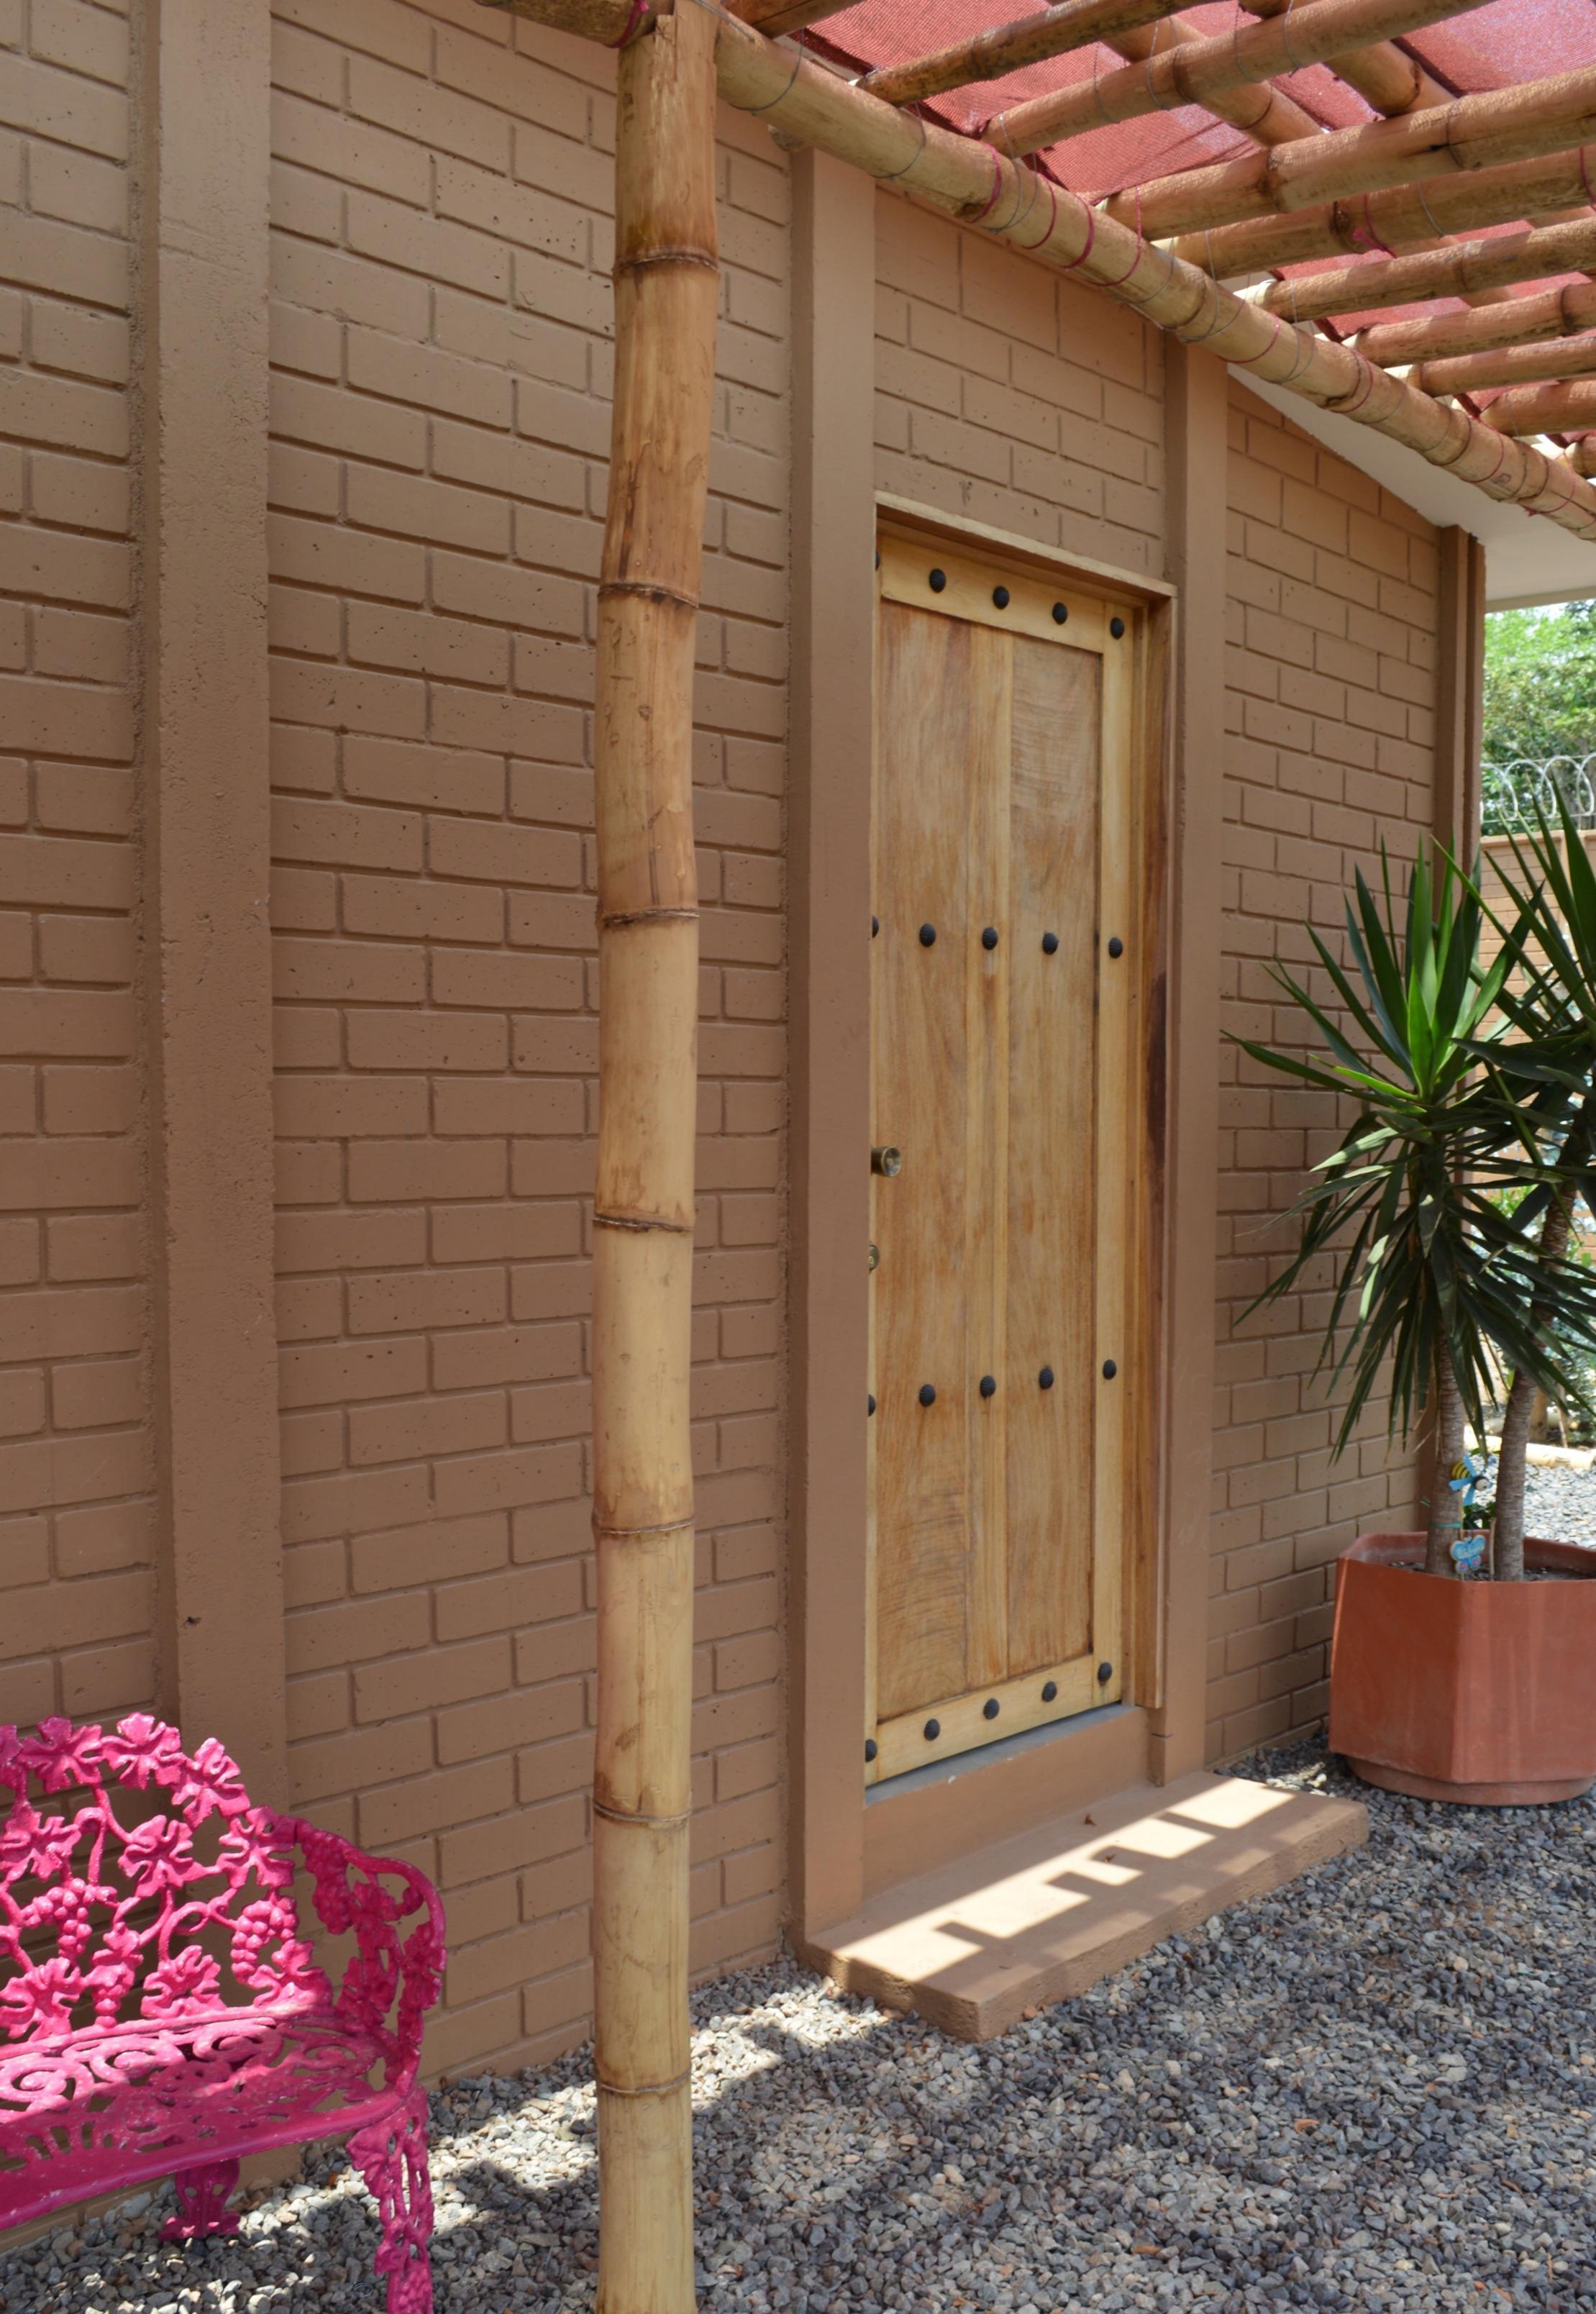 Diferentes acabados, con paredes prefabricadas de concreto.